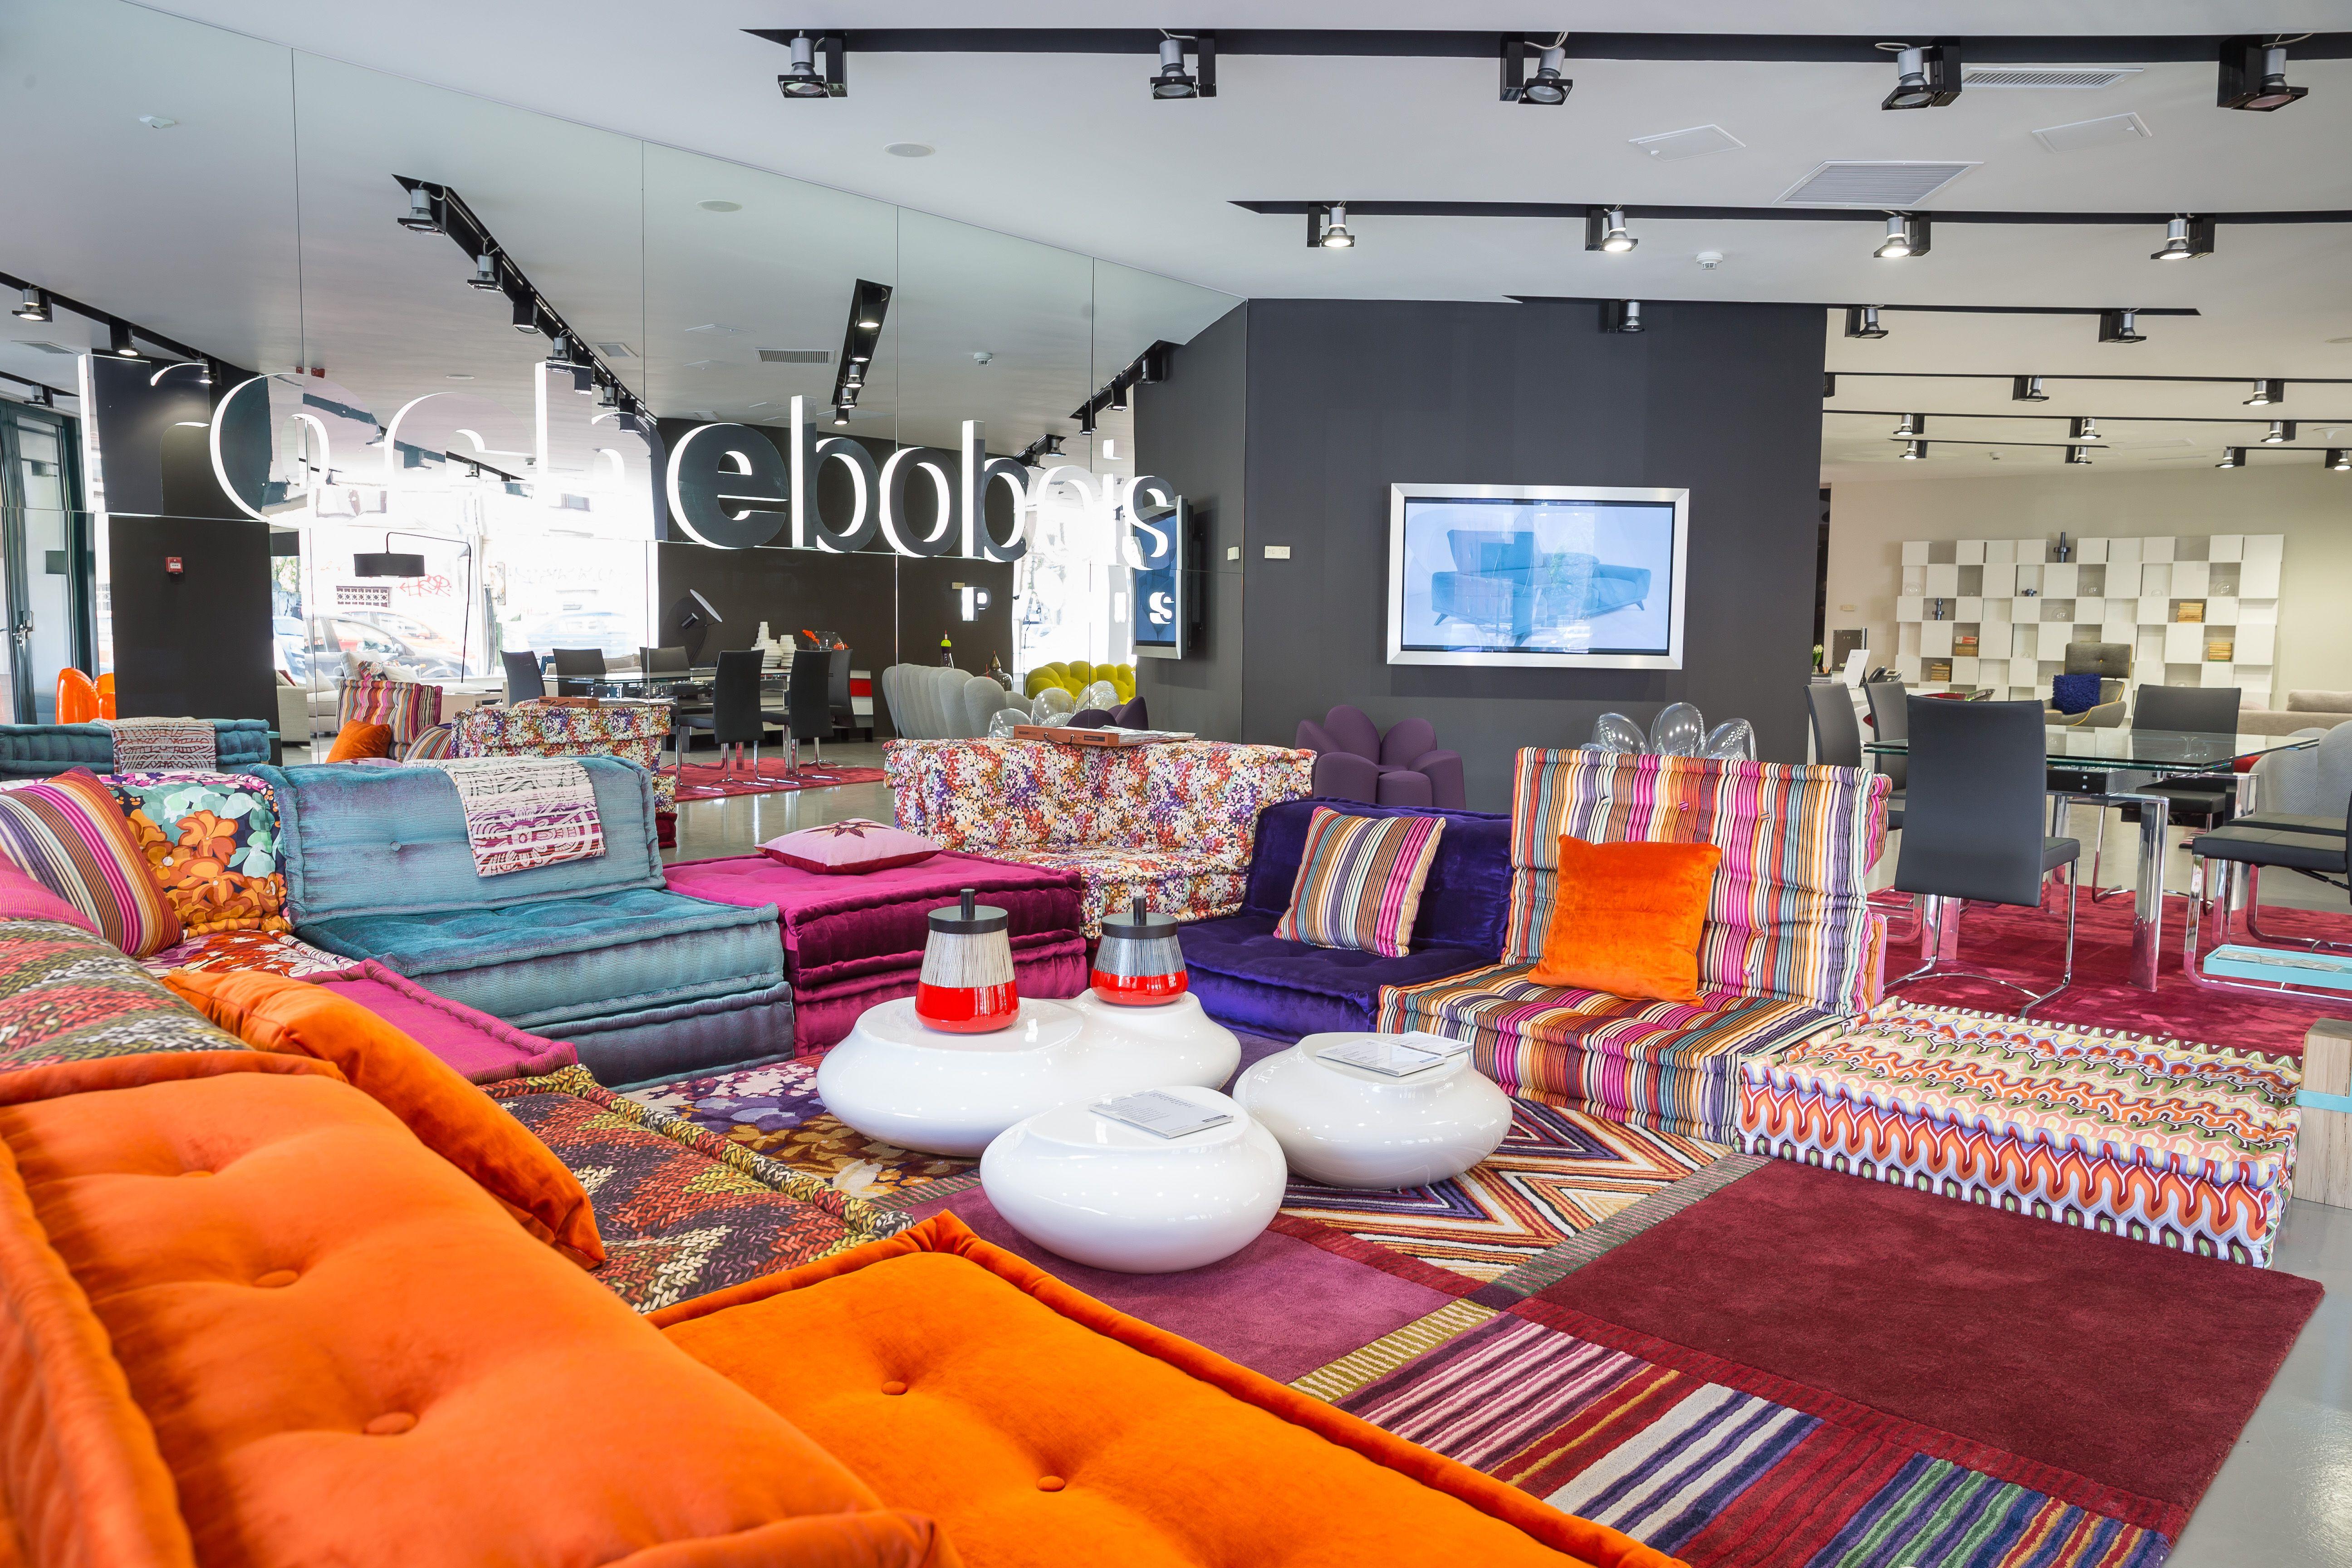 roche bobois opening showroom in bucharest romania interior arrangements pinterest. Black Bedroom Furniture Sets. Home Design Ideas